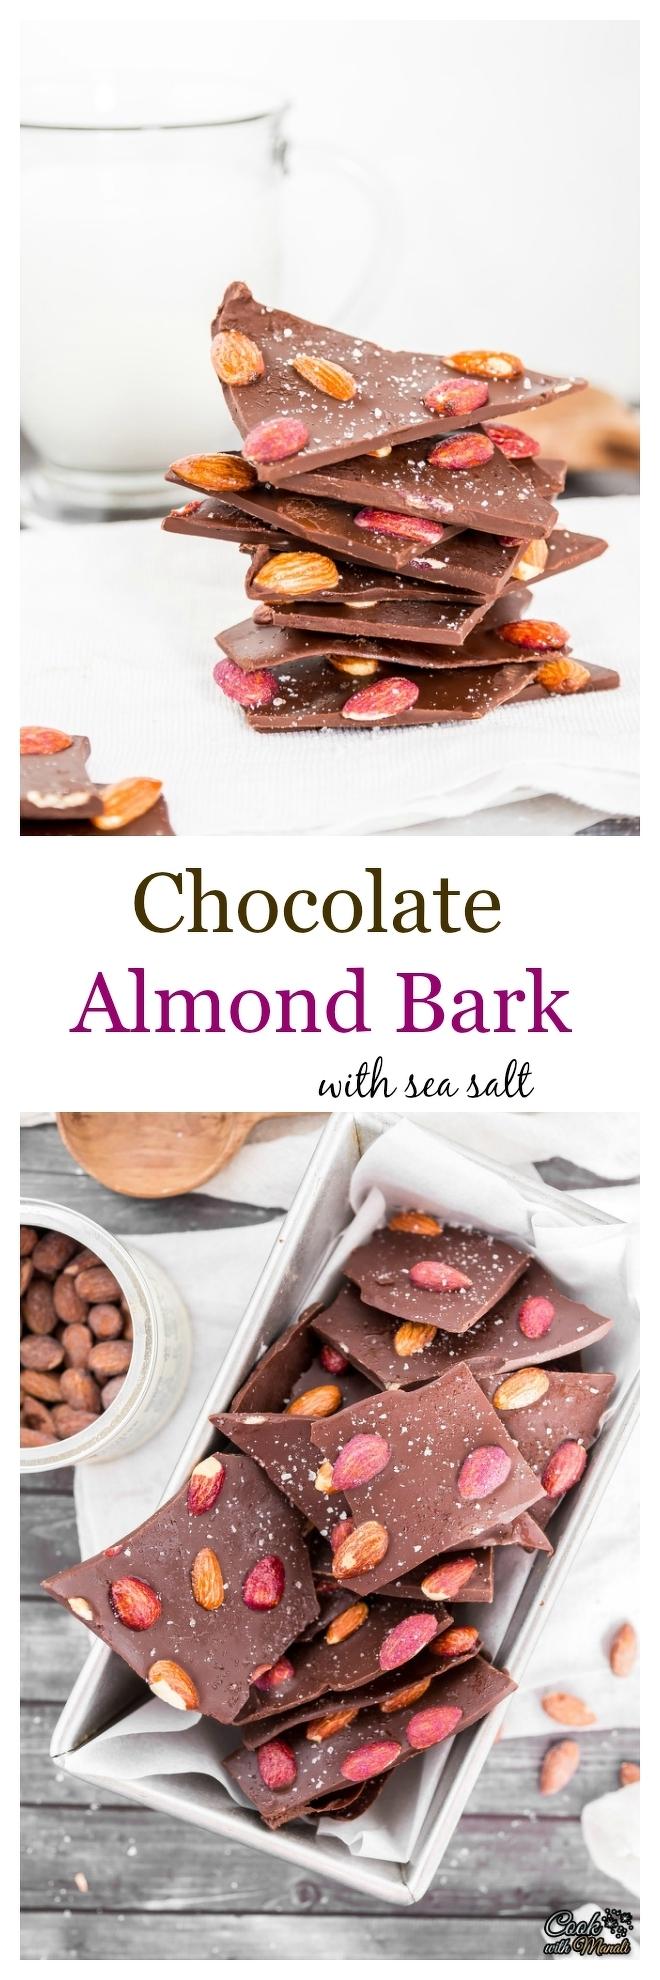 Chocolate Almond Bark with Sea Salt Collage-nocwm